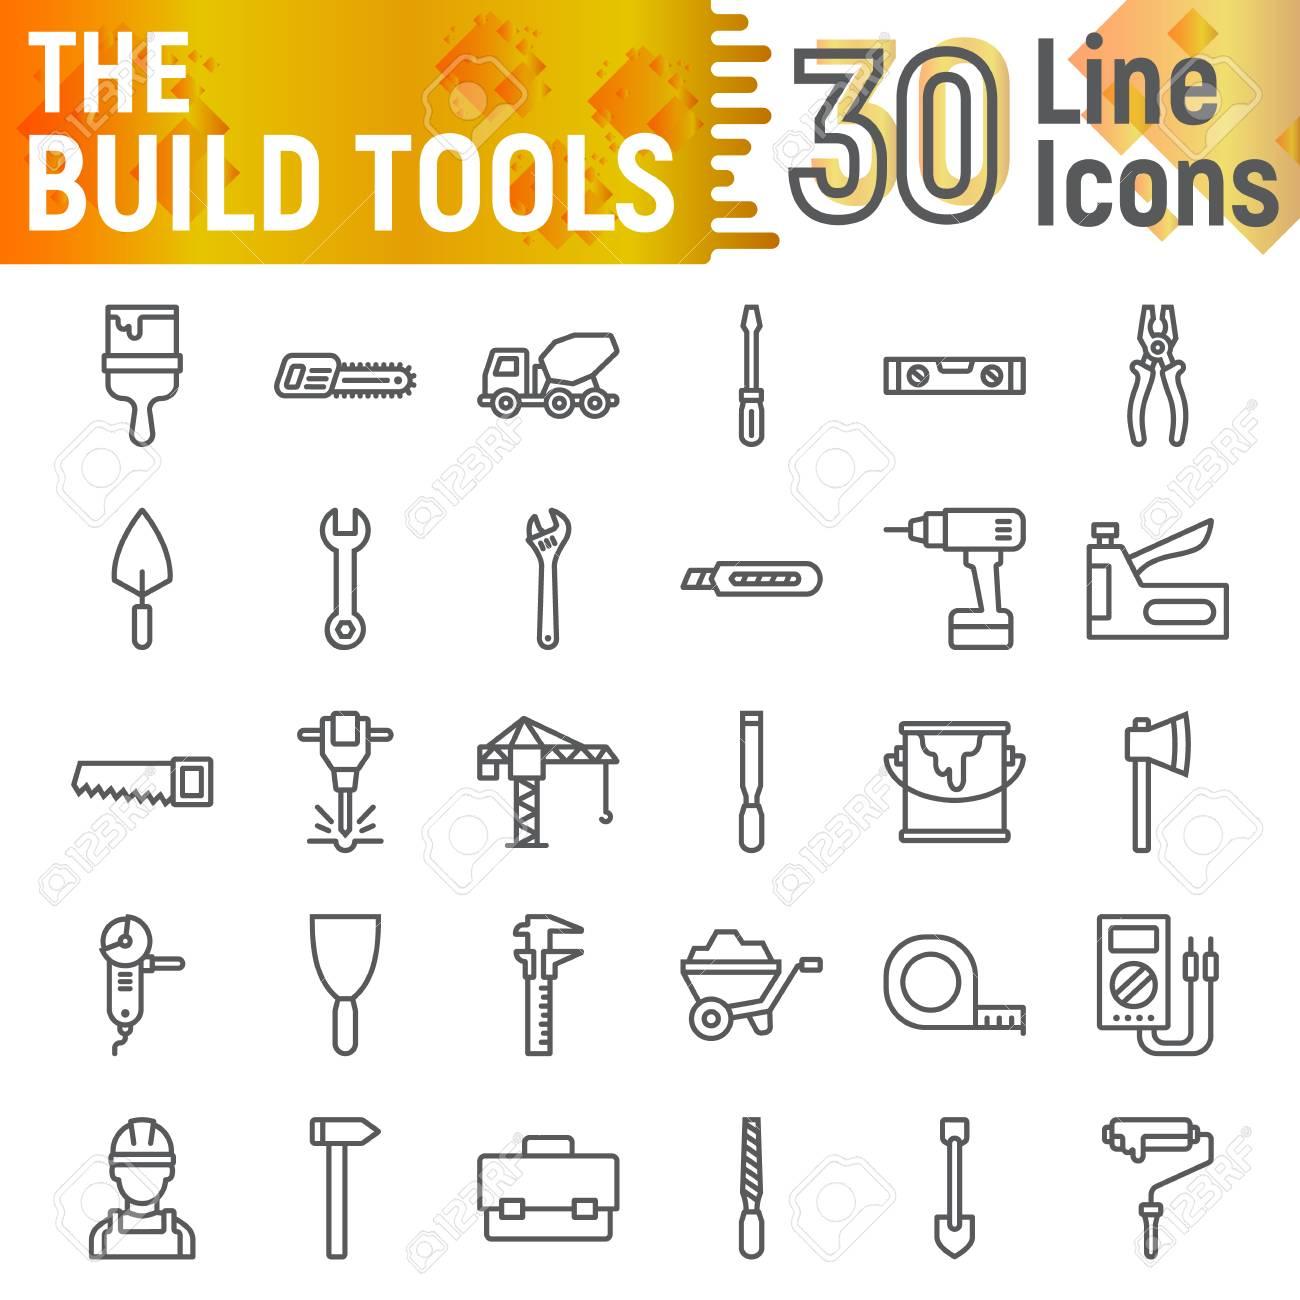 Build Tools Line Icon Set Construction Symbols Collection Vector